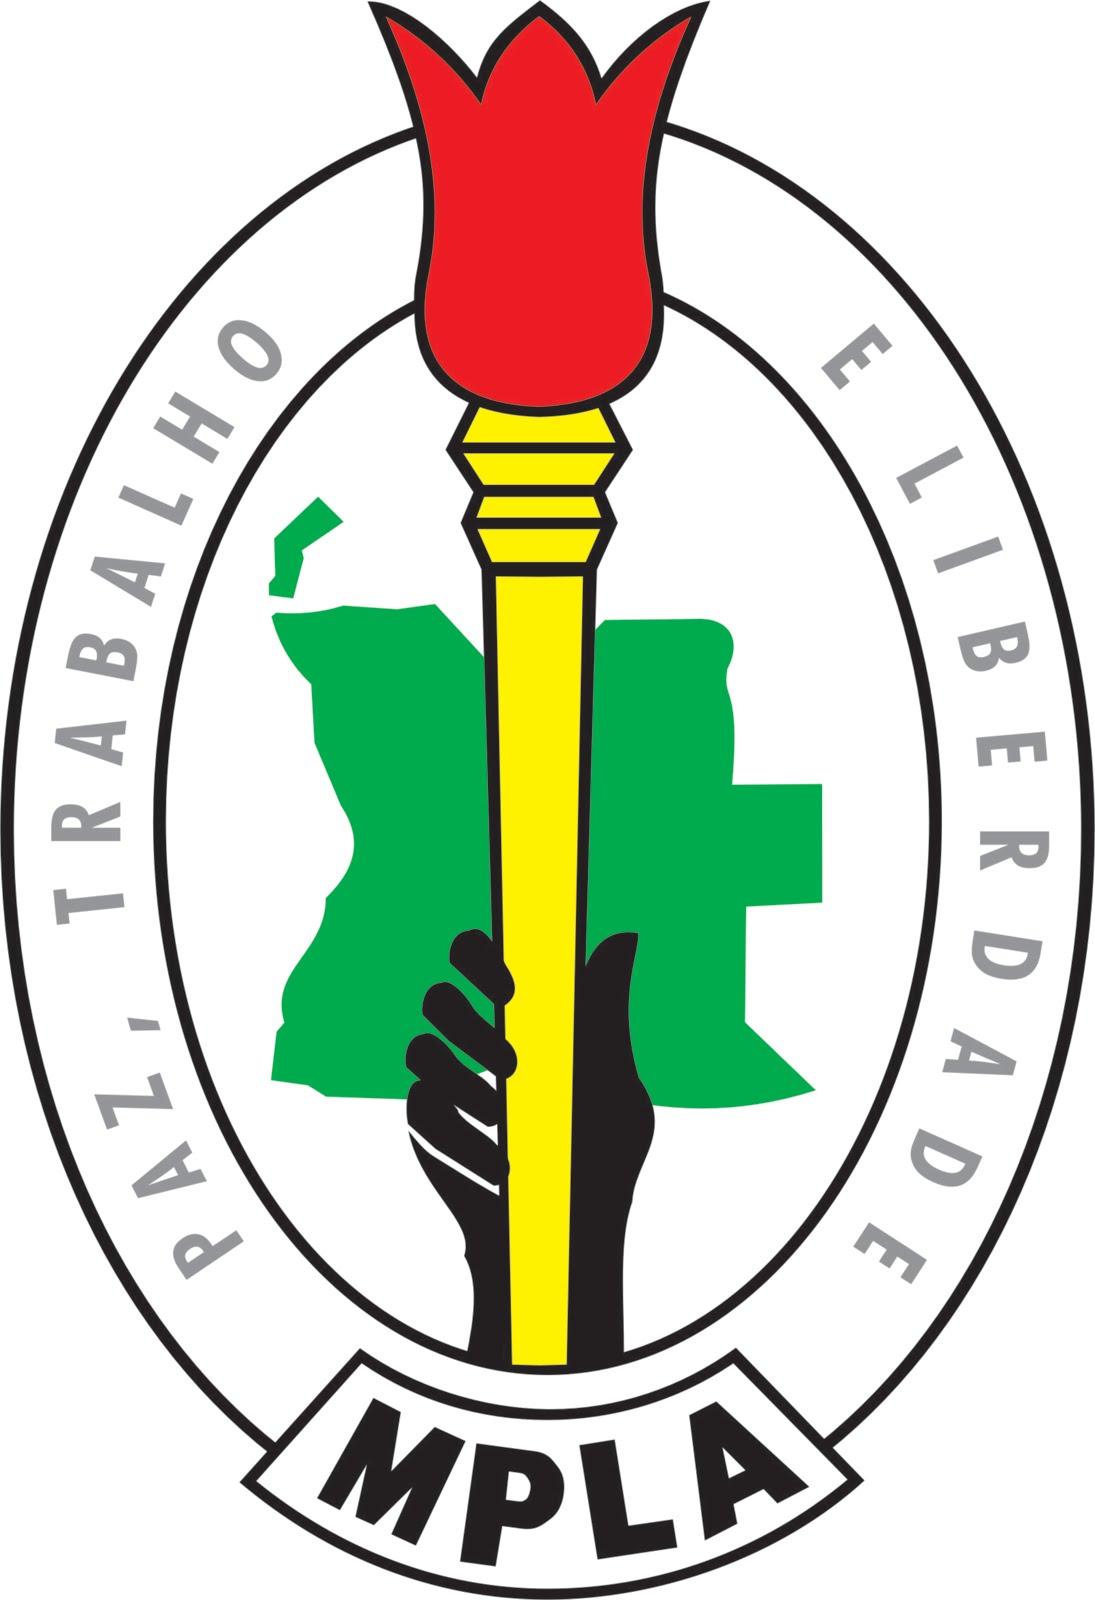 MPLA ONTEM HOJE E SEMPRE: Setembro 2011